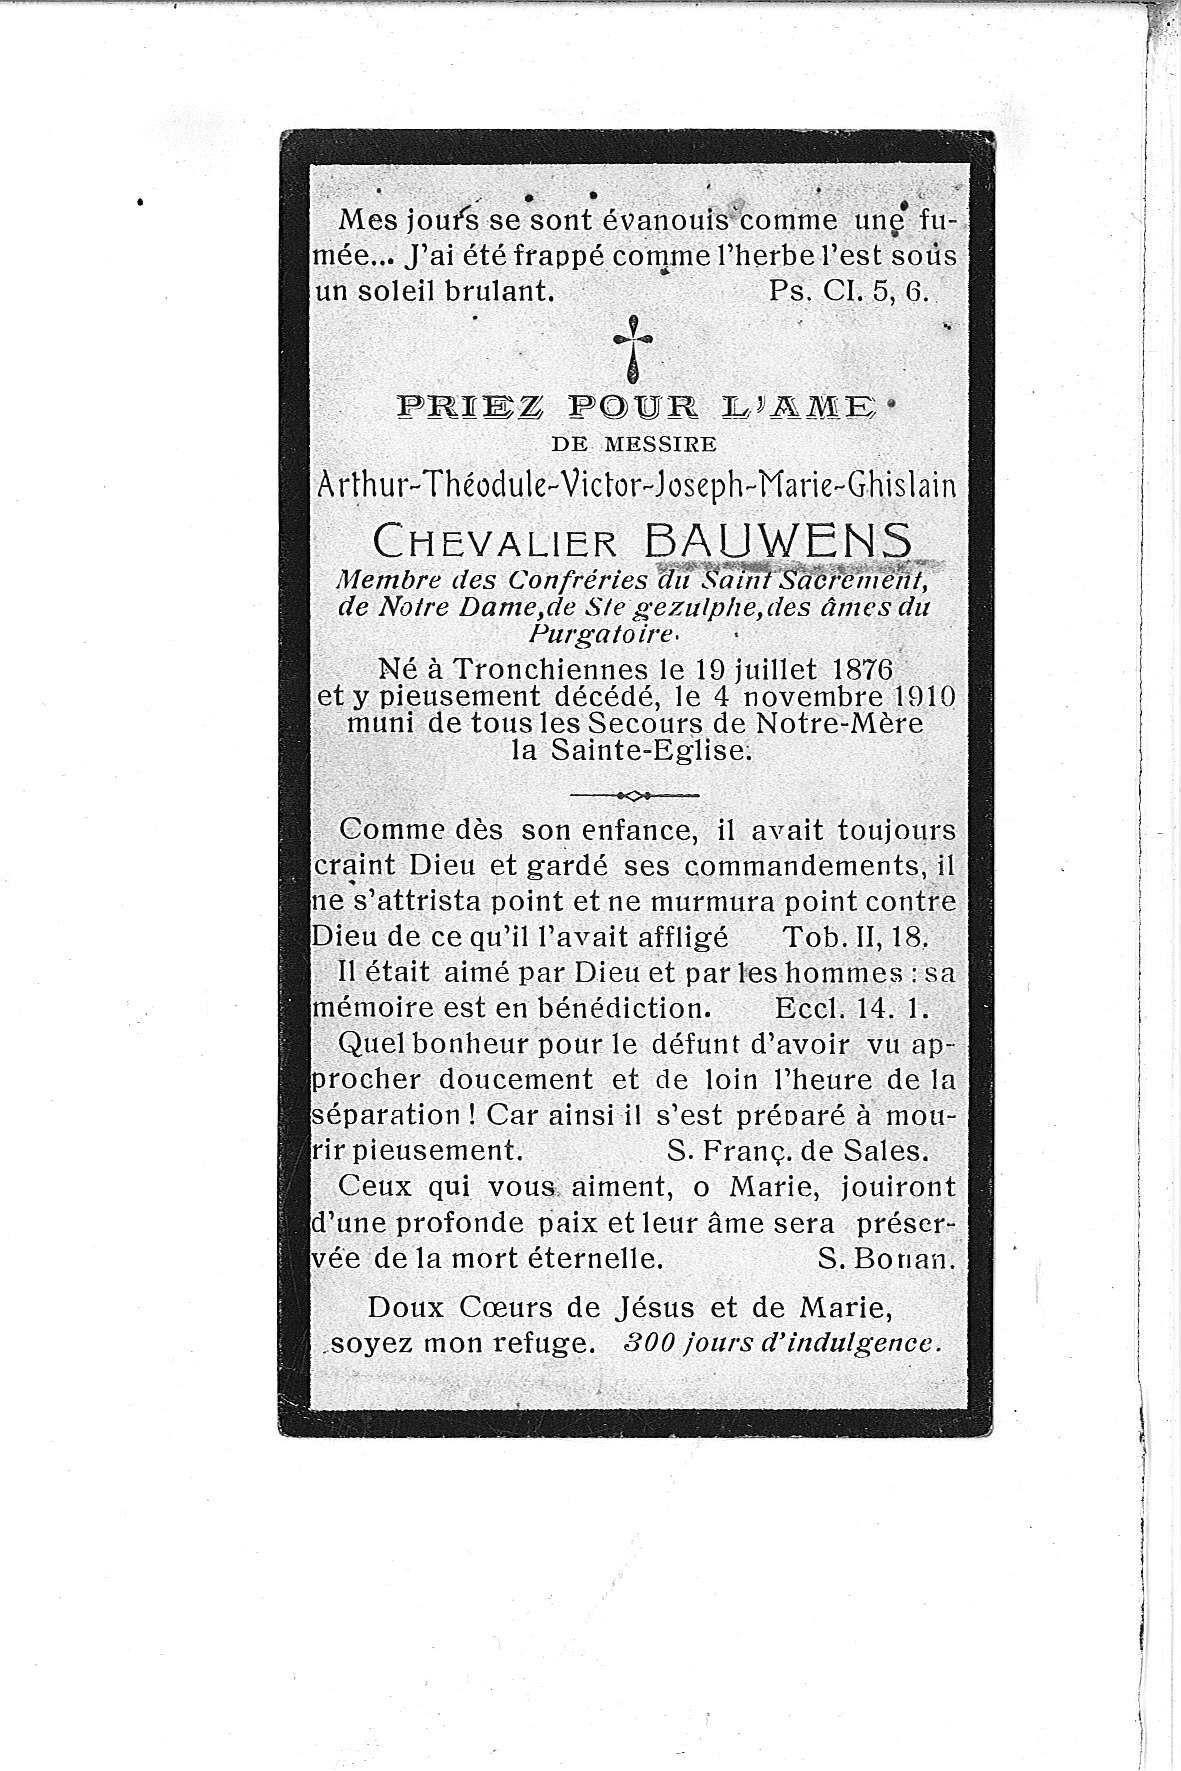 Arthur-Théophile-Victor-Joseph-Marie-Ghislain(1910)20101026103900_00011.jpg